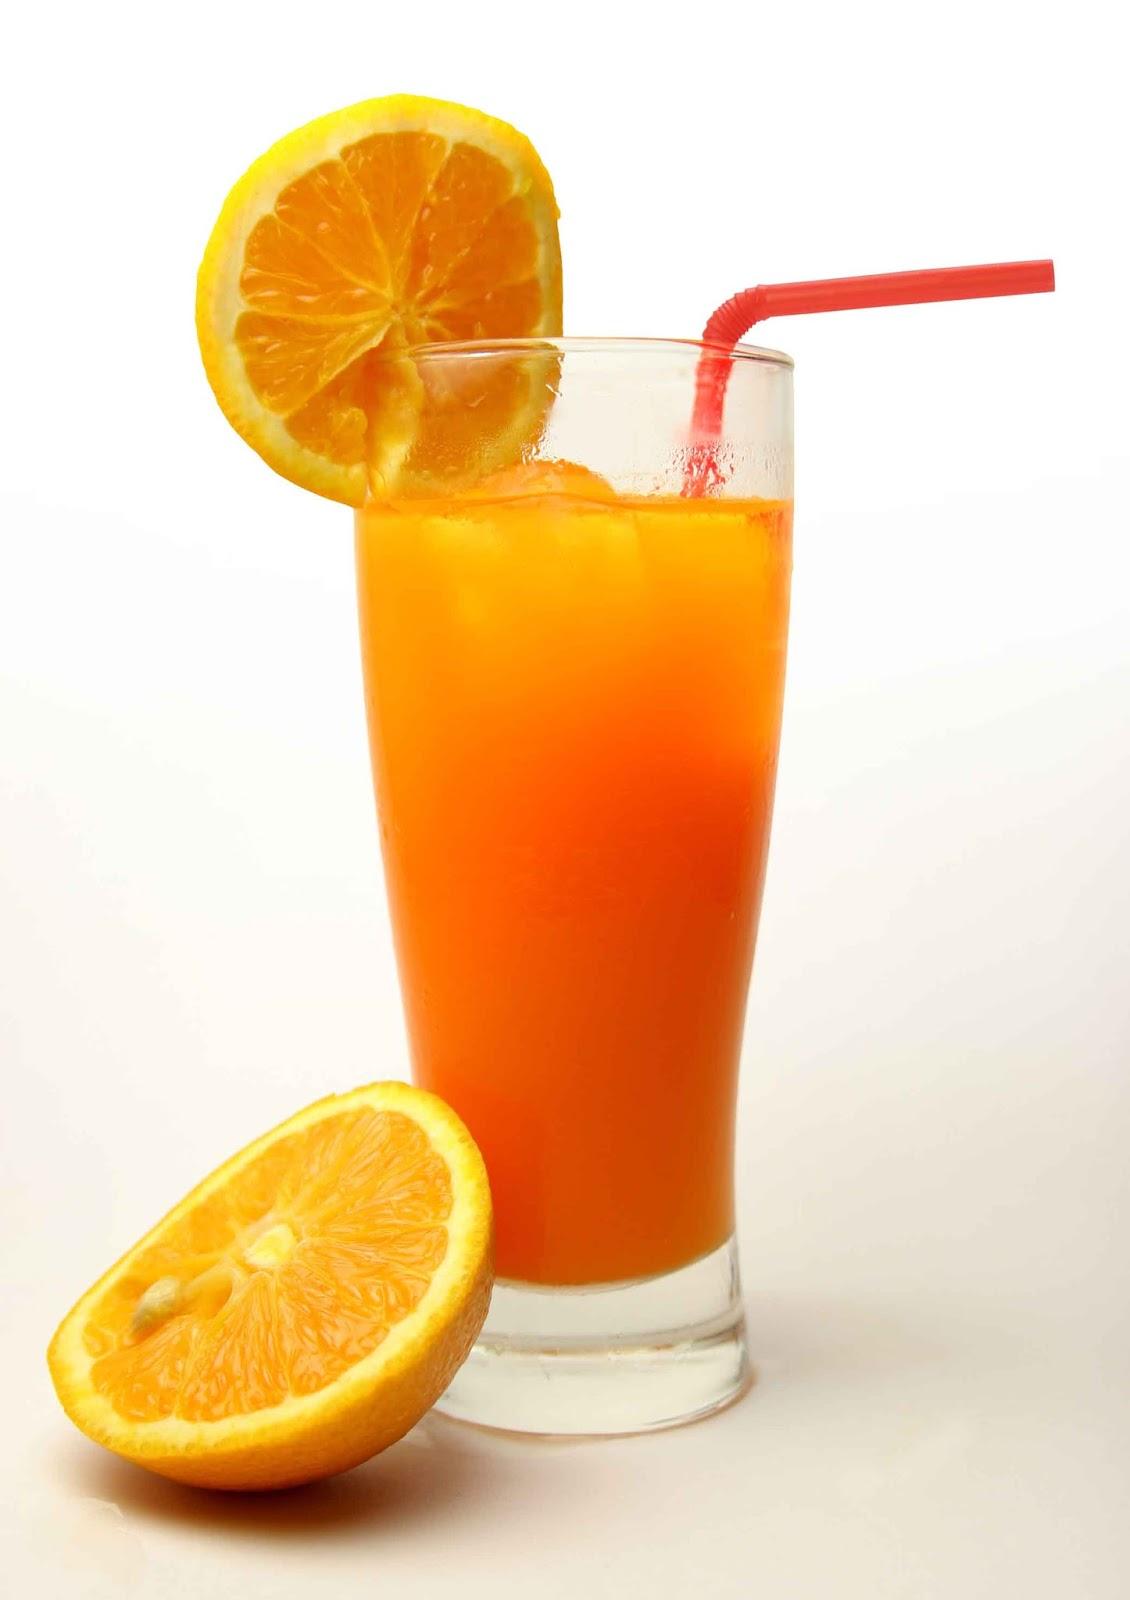 atasi gangguan pencernaan dengan jus jeruk